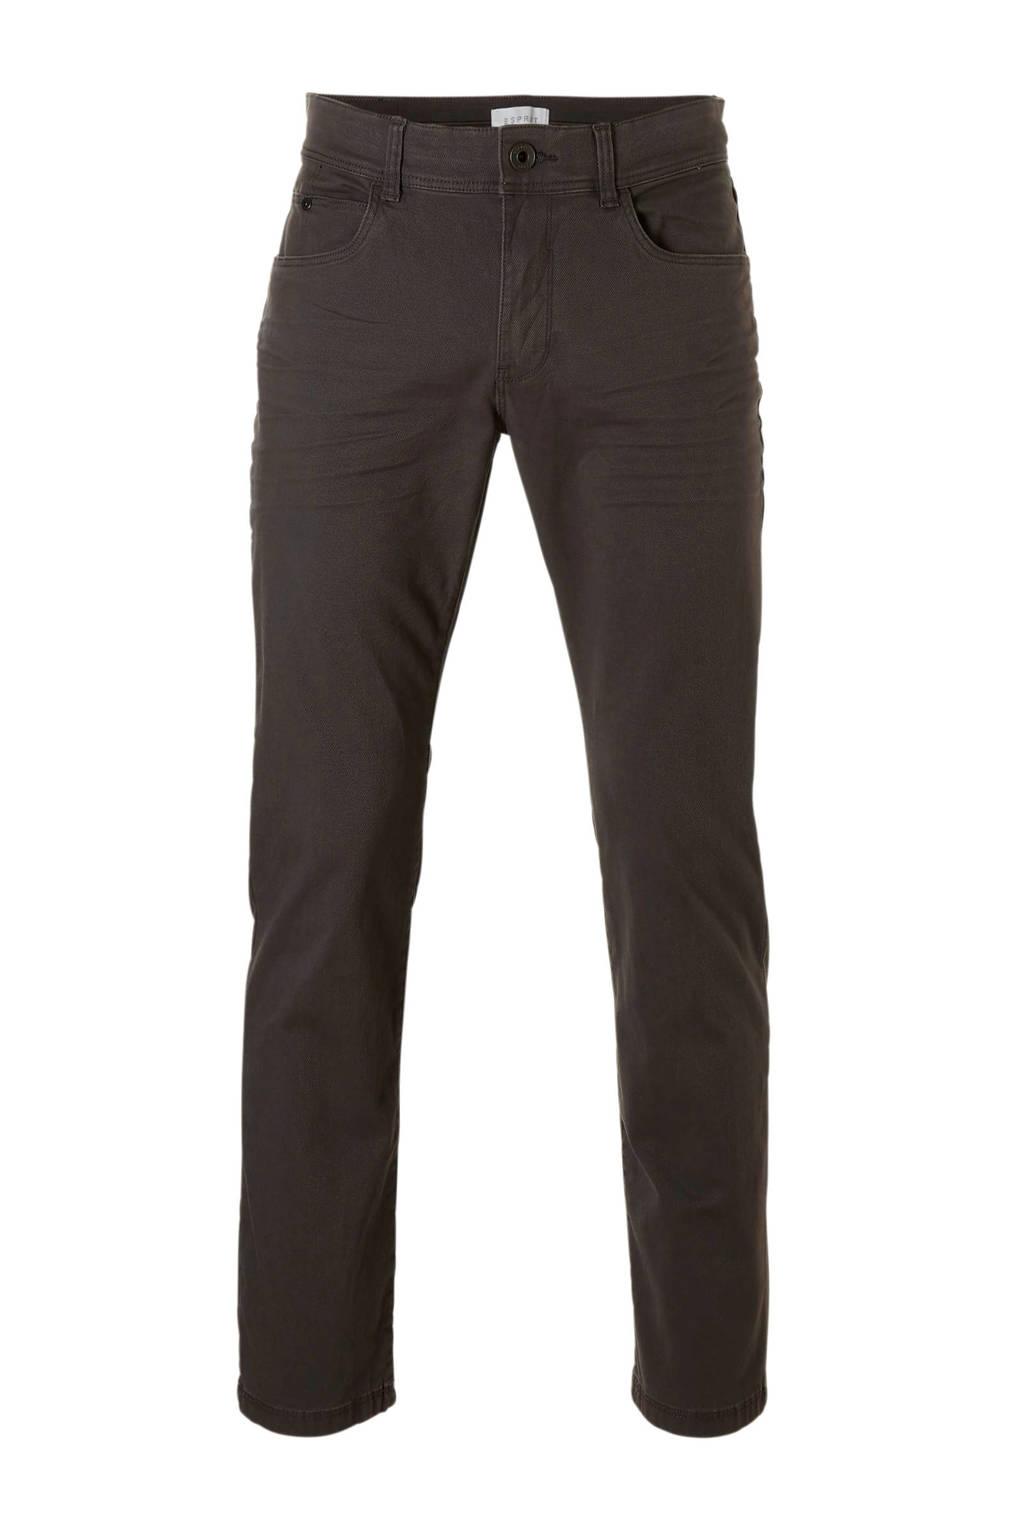 ESPRIT Men Casual  regular jeans, Grijs